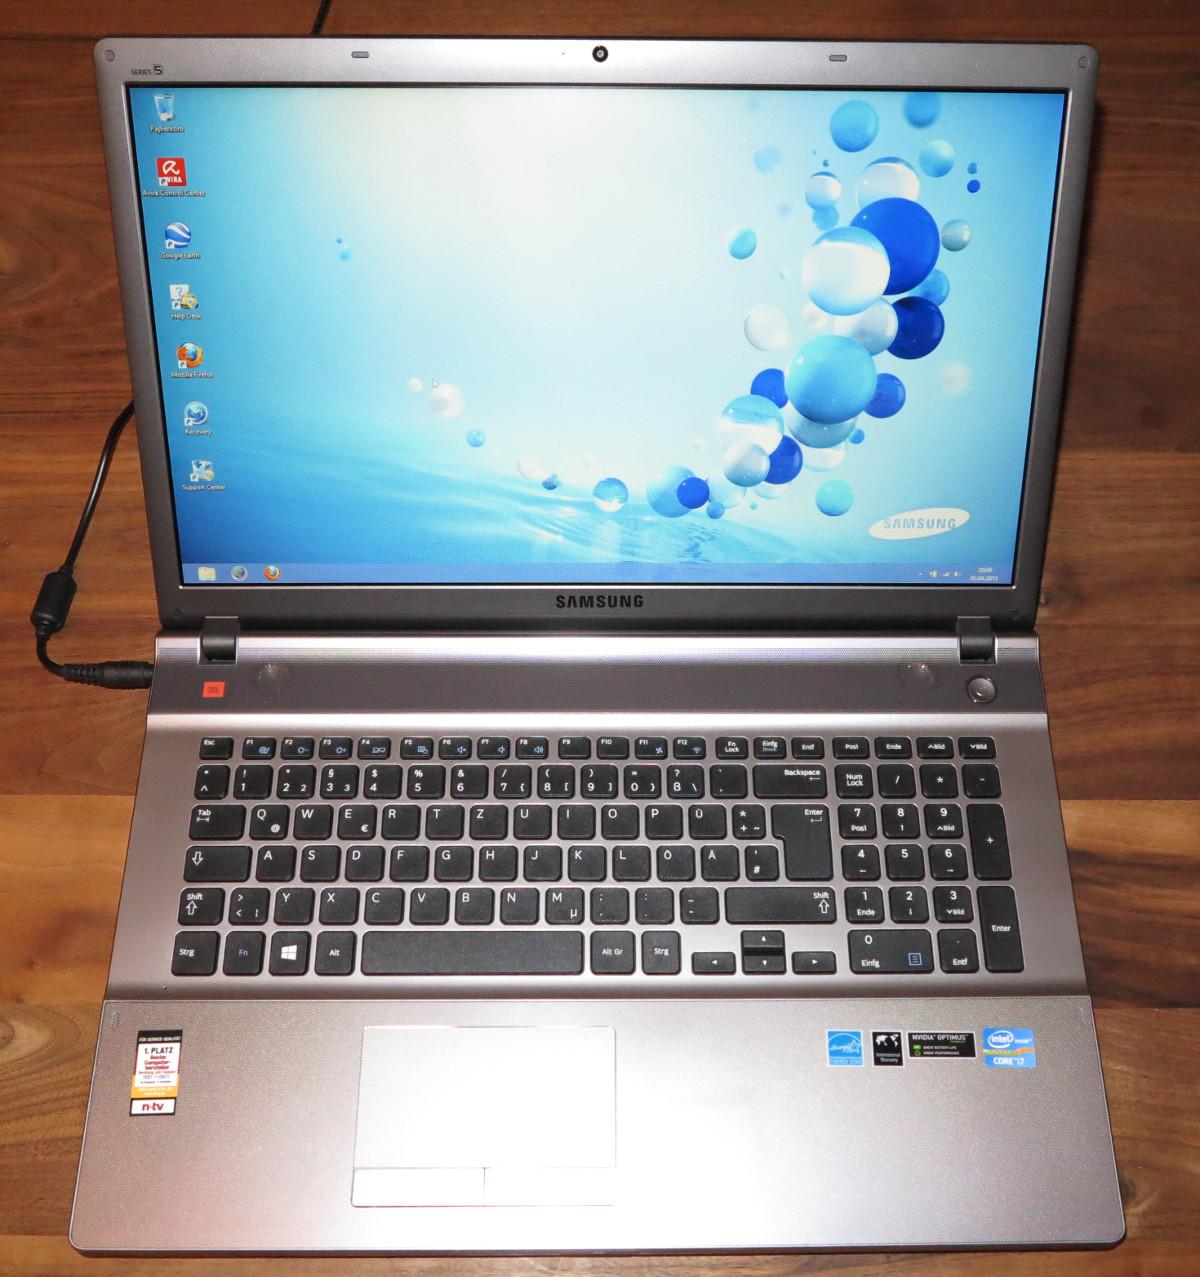 Samsung Serie 5 550P7C S0E Notebook – Testbericht 1 – 2